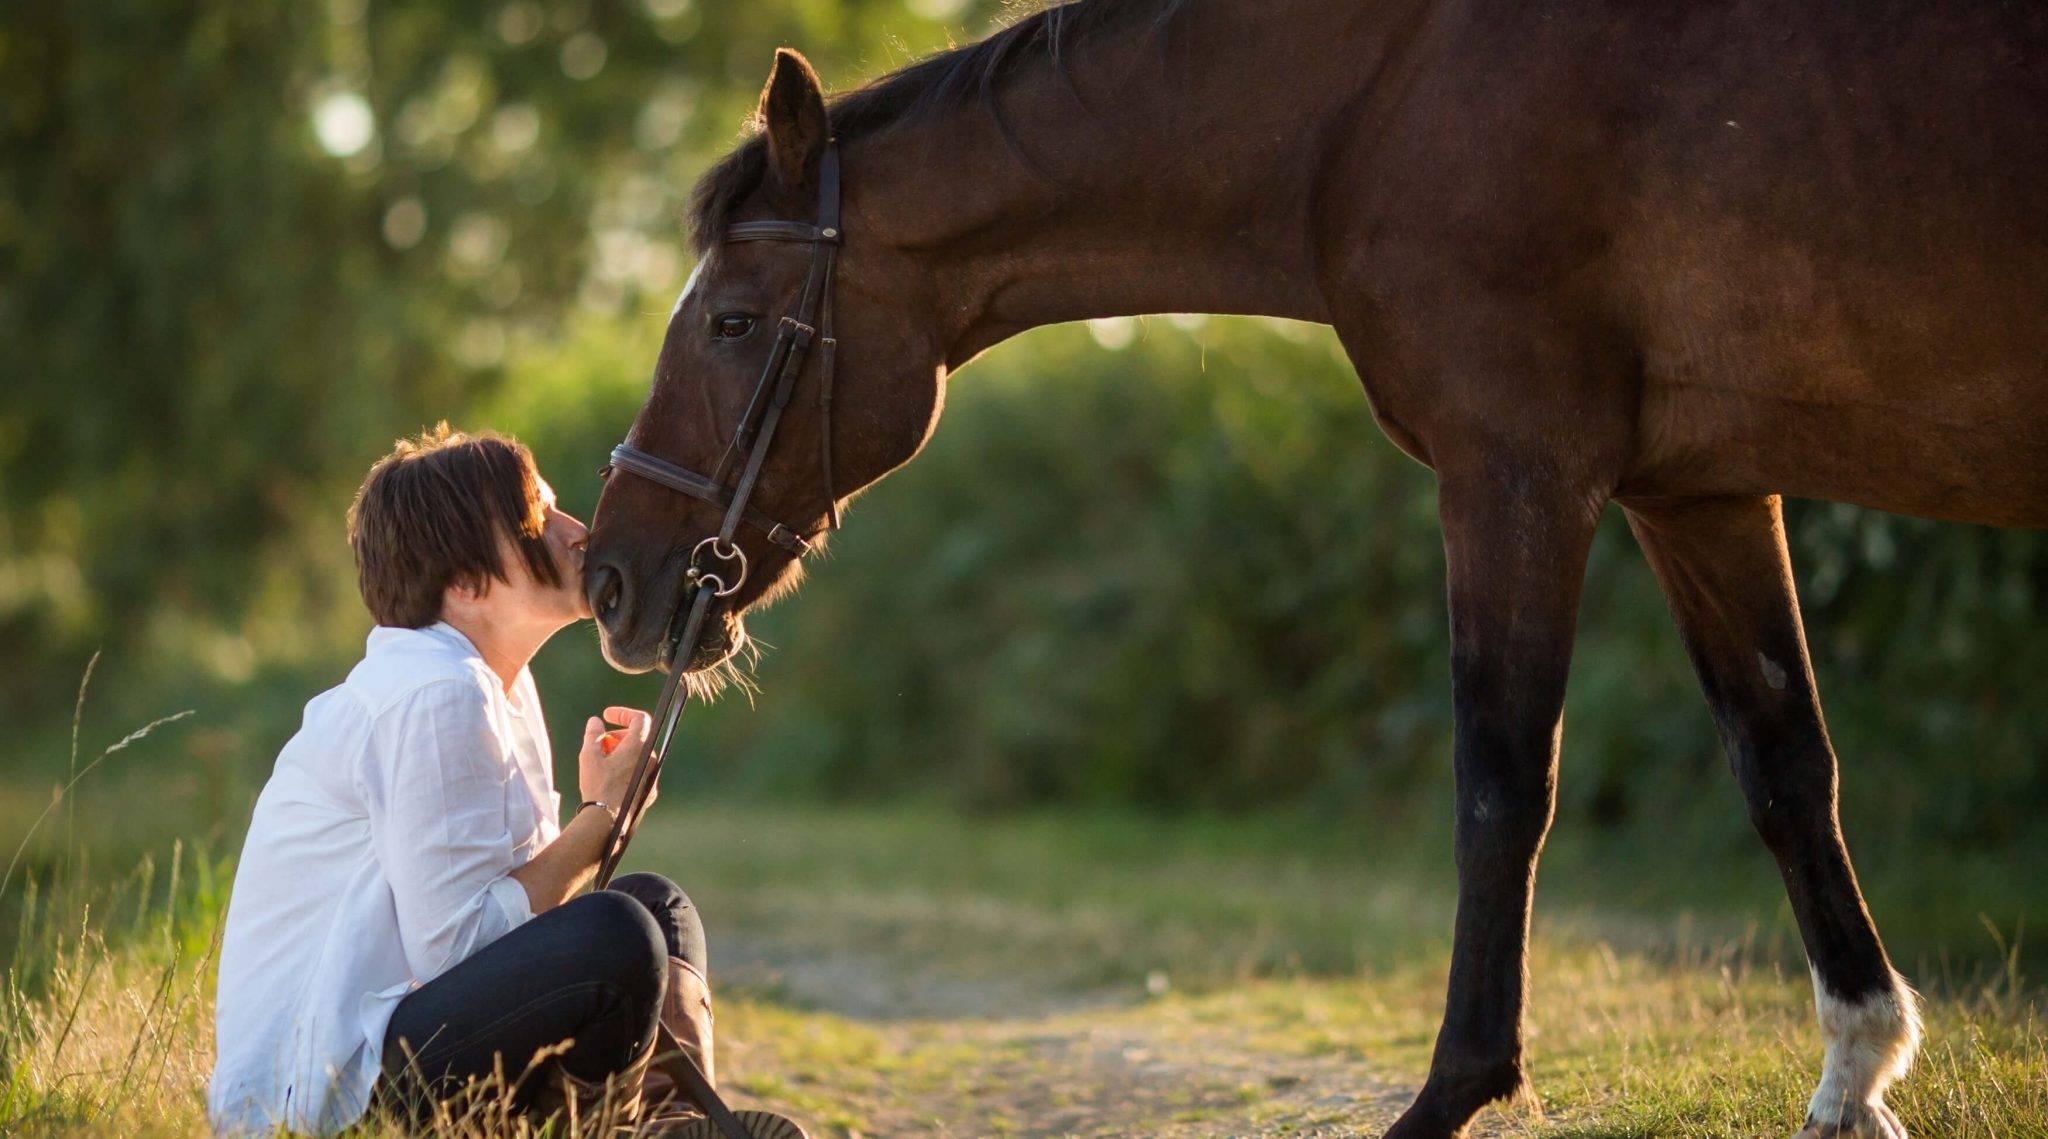 Equester Riding Club - slider 2